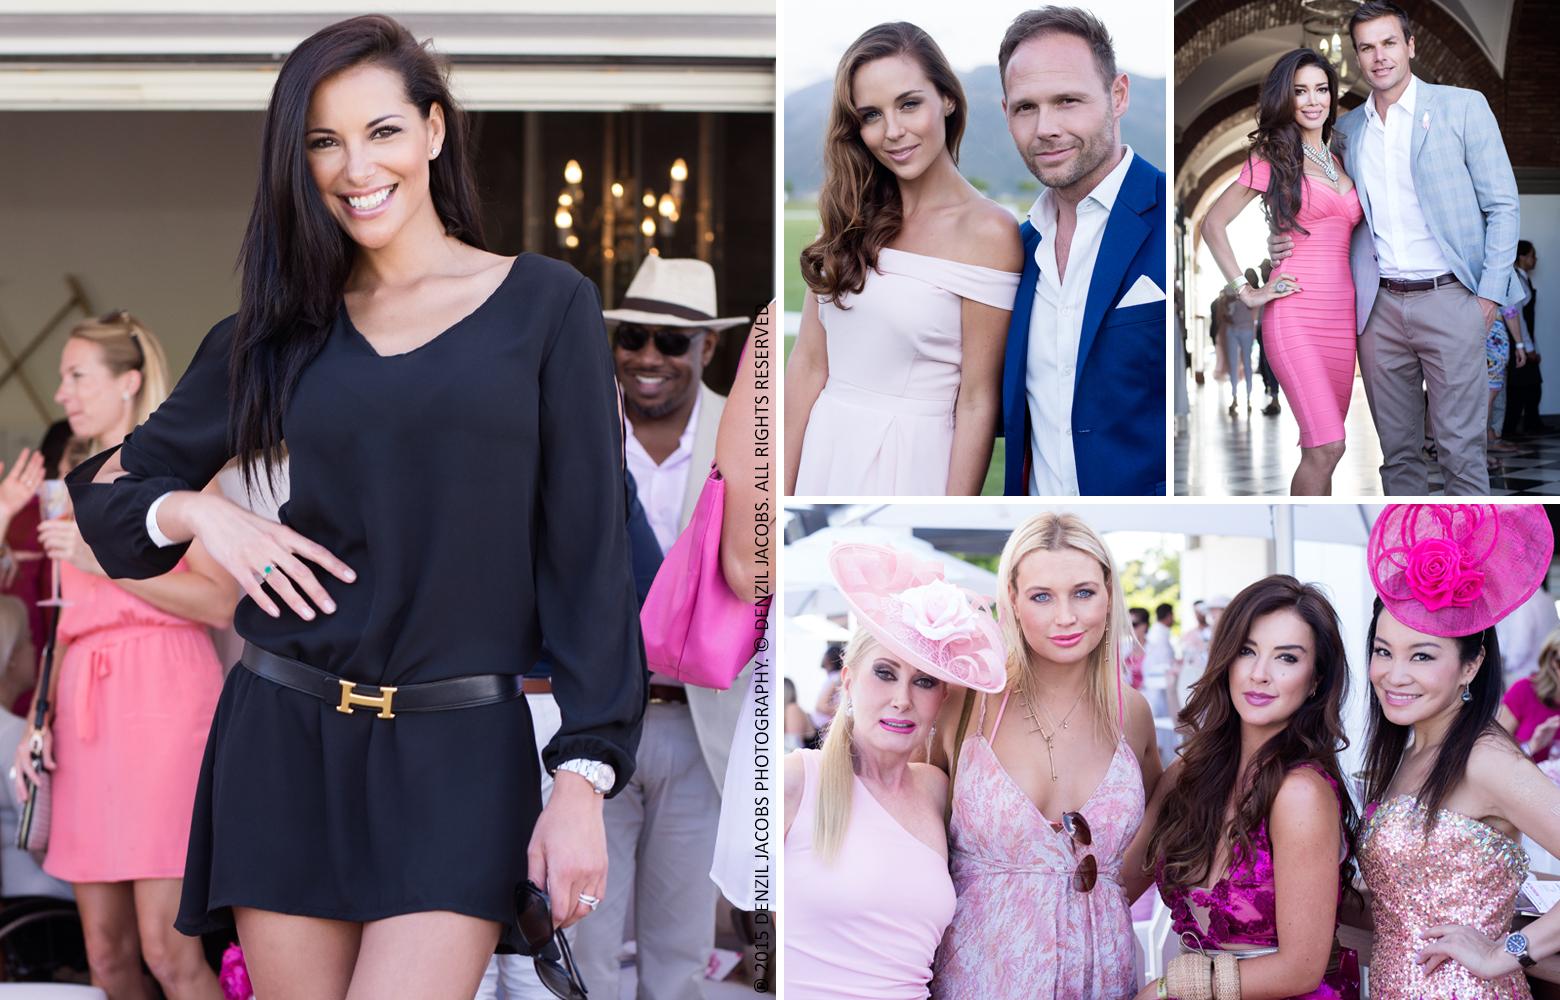 11.15-Pink-Polo-2015-Lee-Ann-Liebenberg,-Jen-Su,-Cindy-Nell,-Tanya-van-Graan,-Roxy-Louw,-Ryk-Neethling,-Sahar-Biniaz,-Peta-Eggierth-Symes-(by-Denzil-Jacobs)